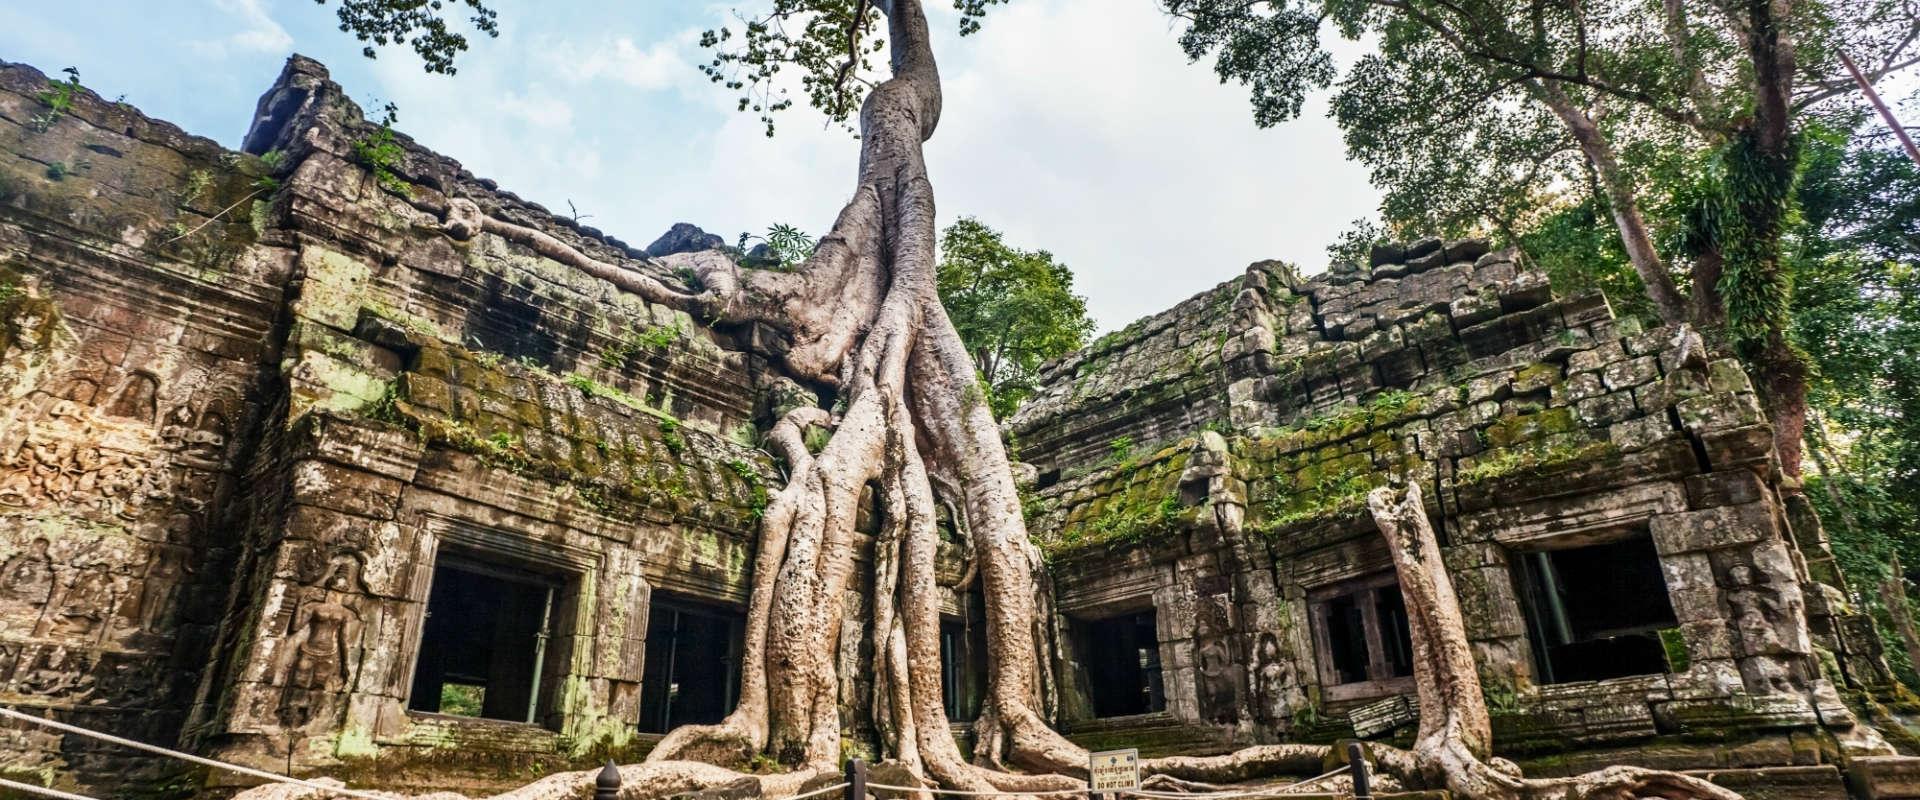 Ta-Prohm-Temple-Siem-Reap-Cambodia